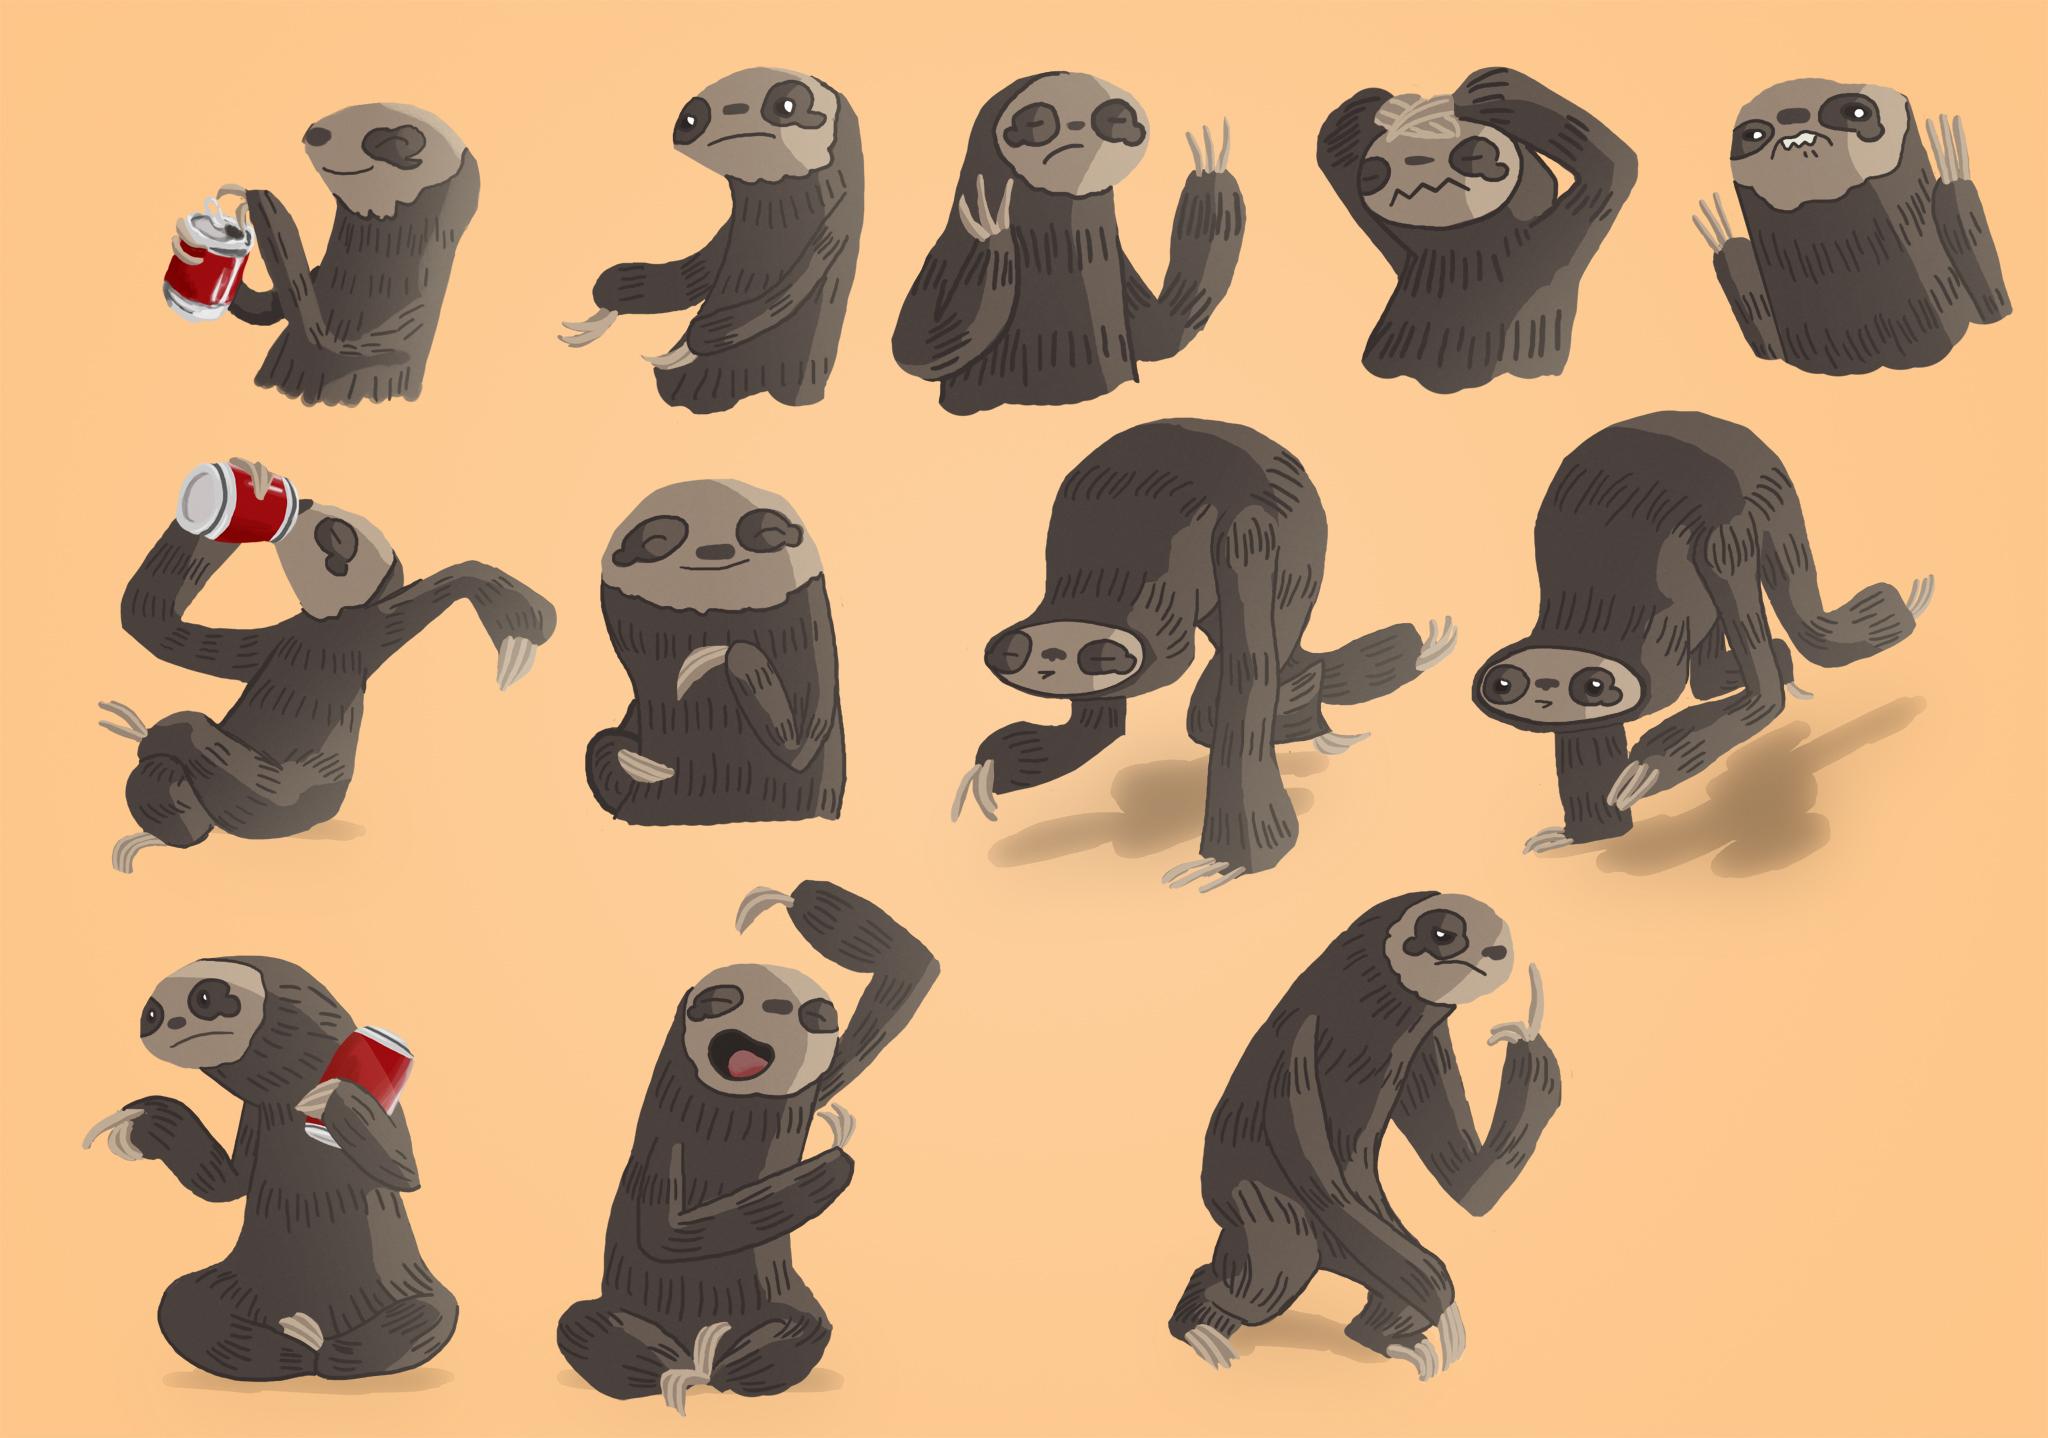 Sloth character